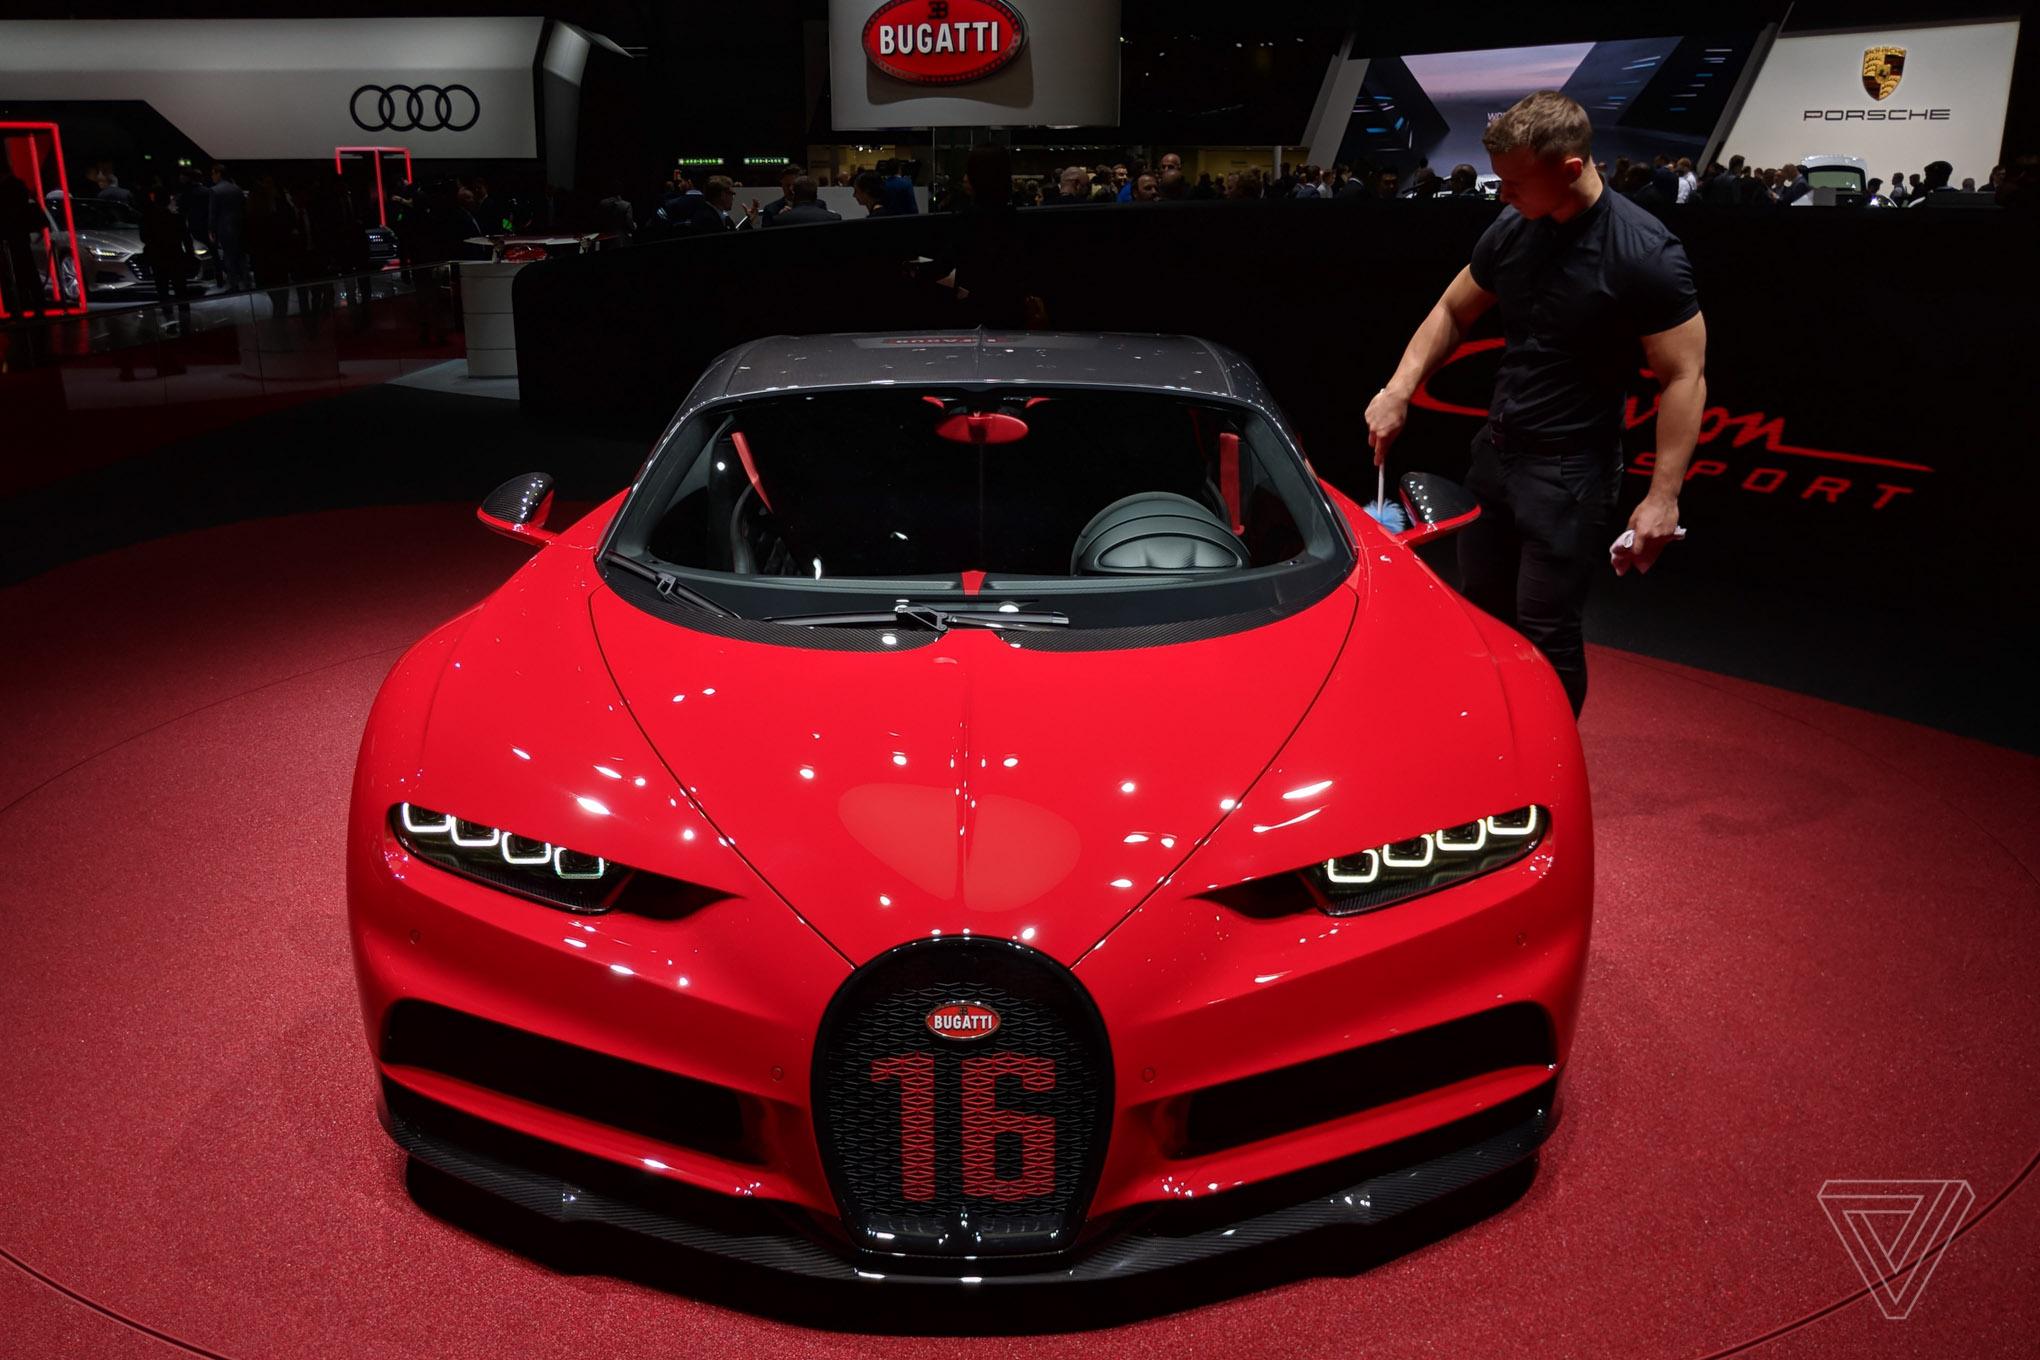 sitting inside bugatti's new $3m chiron didn't make me a better